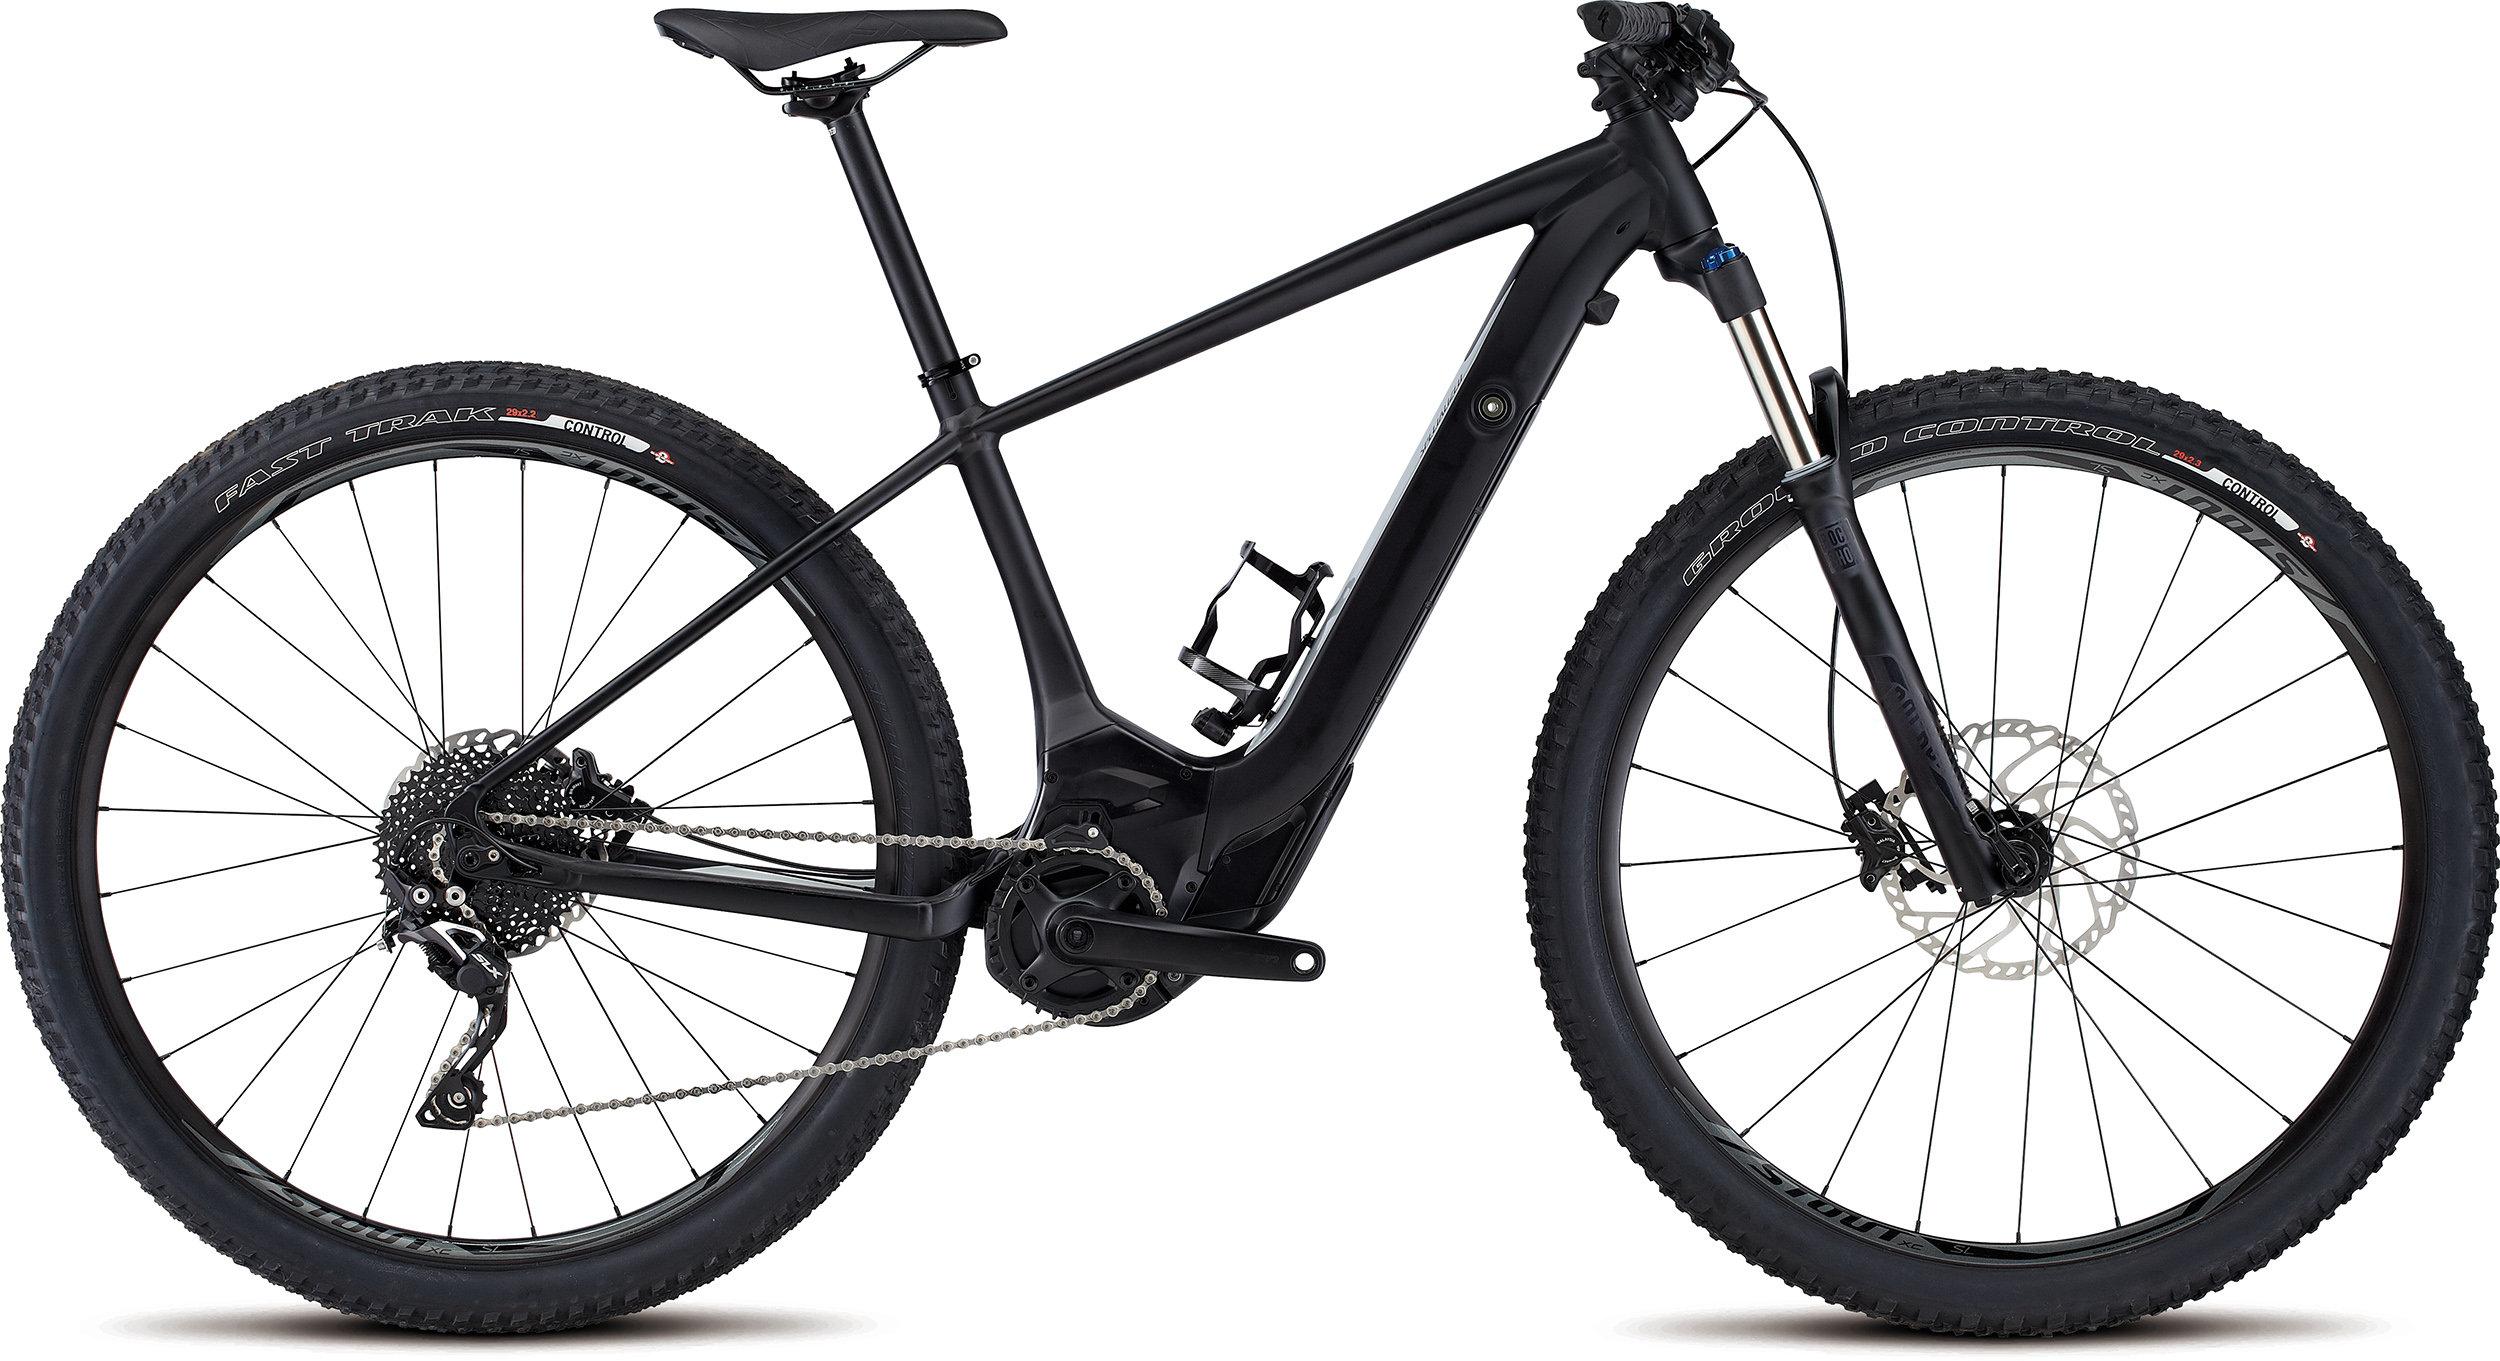 SPECIALIZED LEVO HT 29 CE BLK/KLSIL L - Alpha Bikes